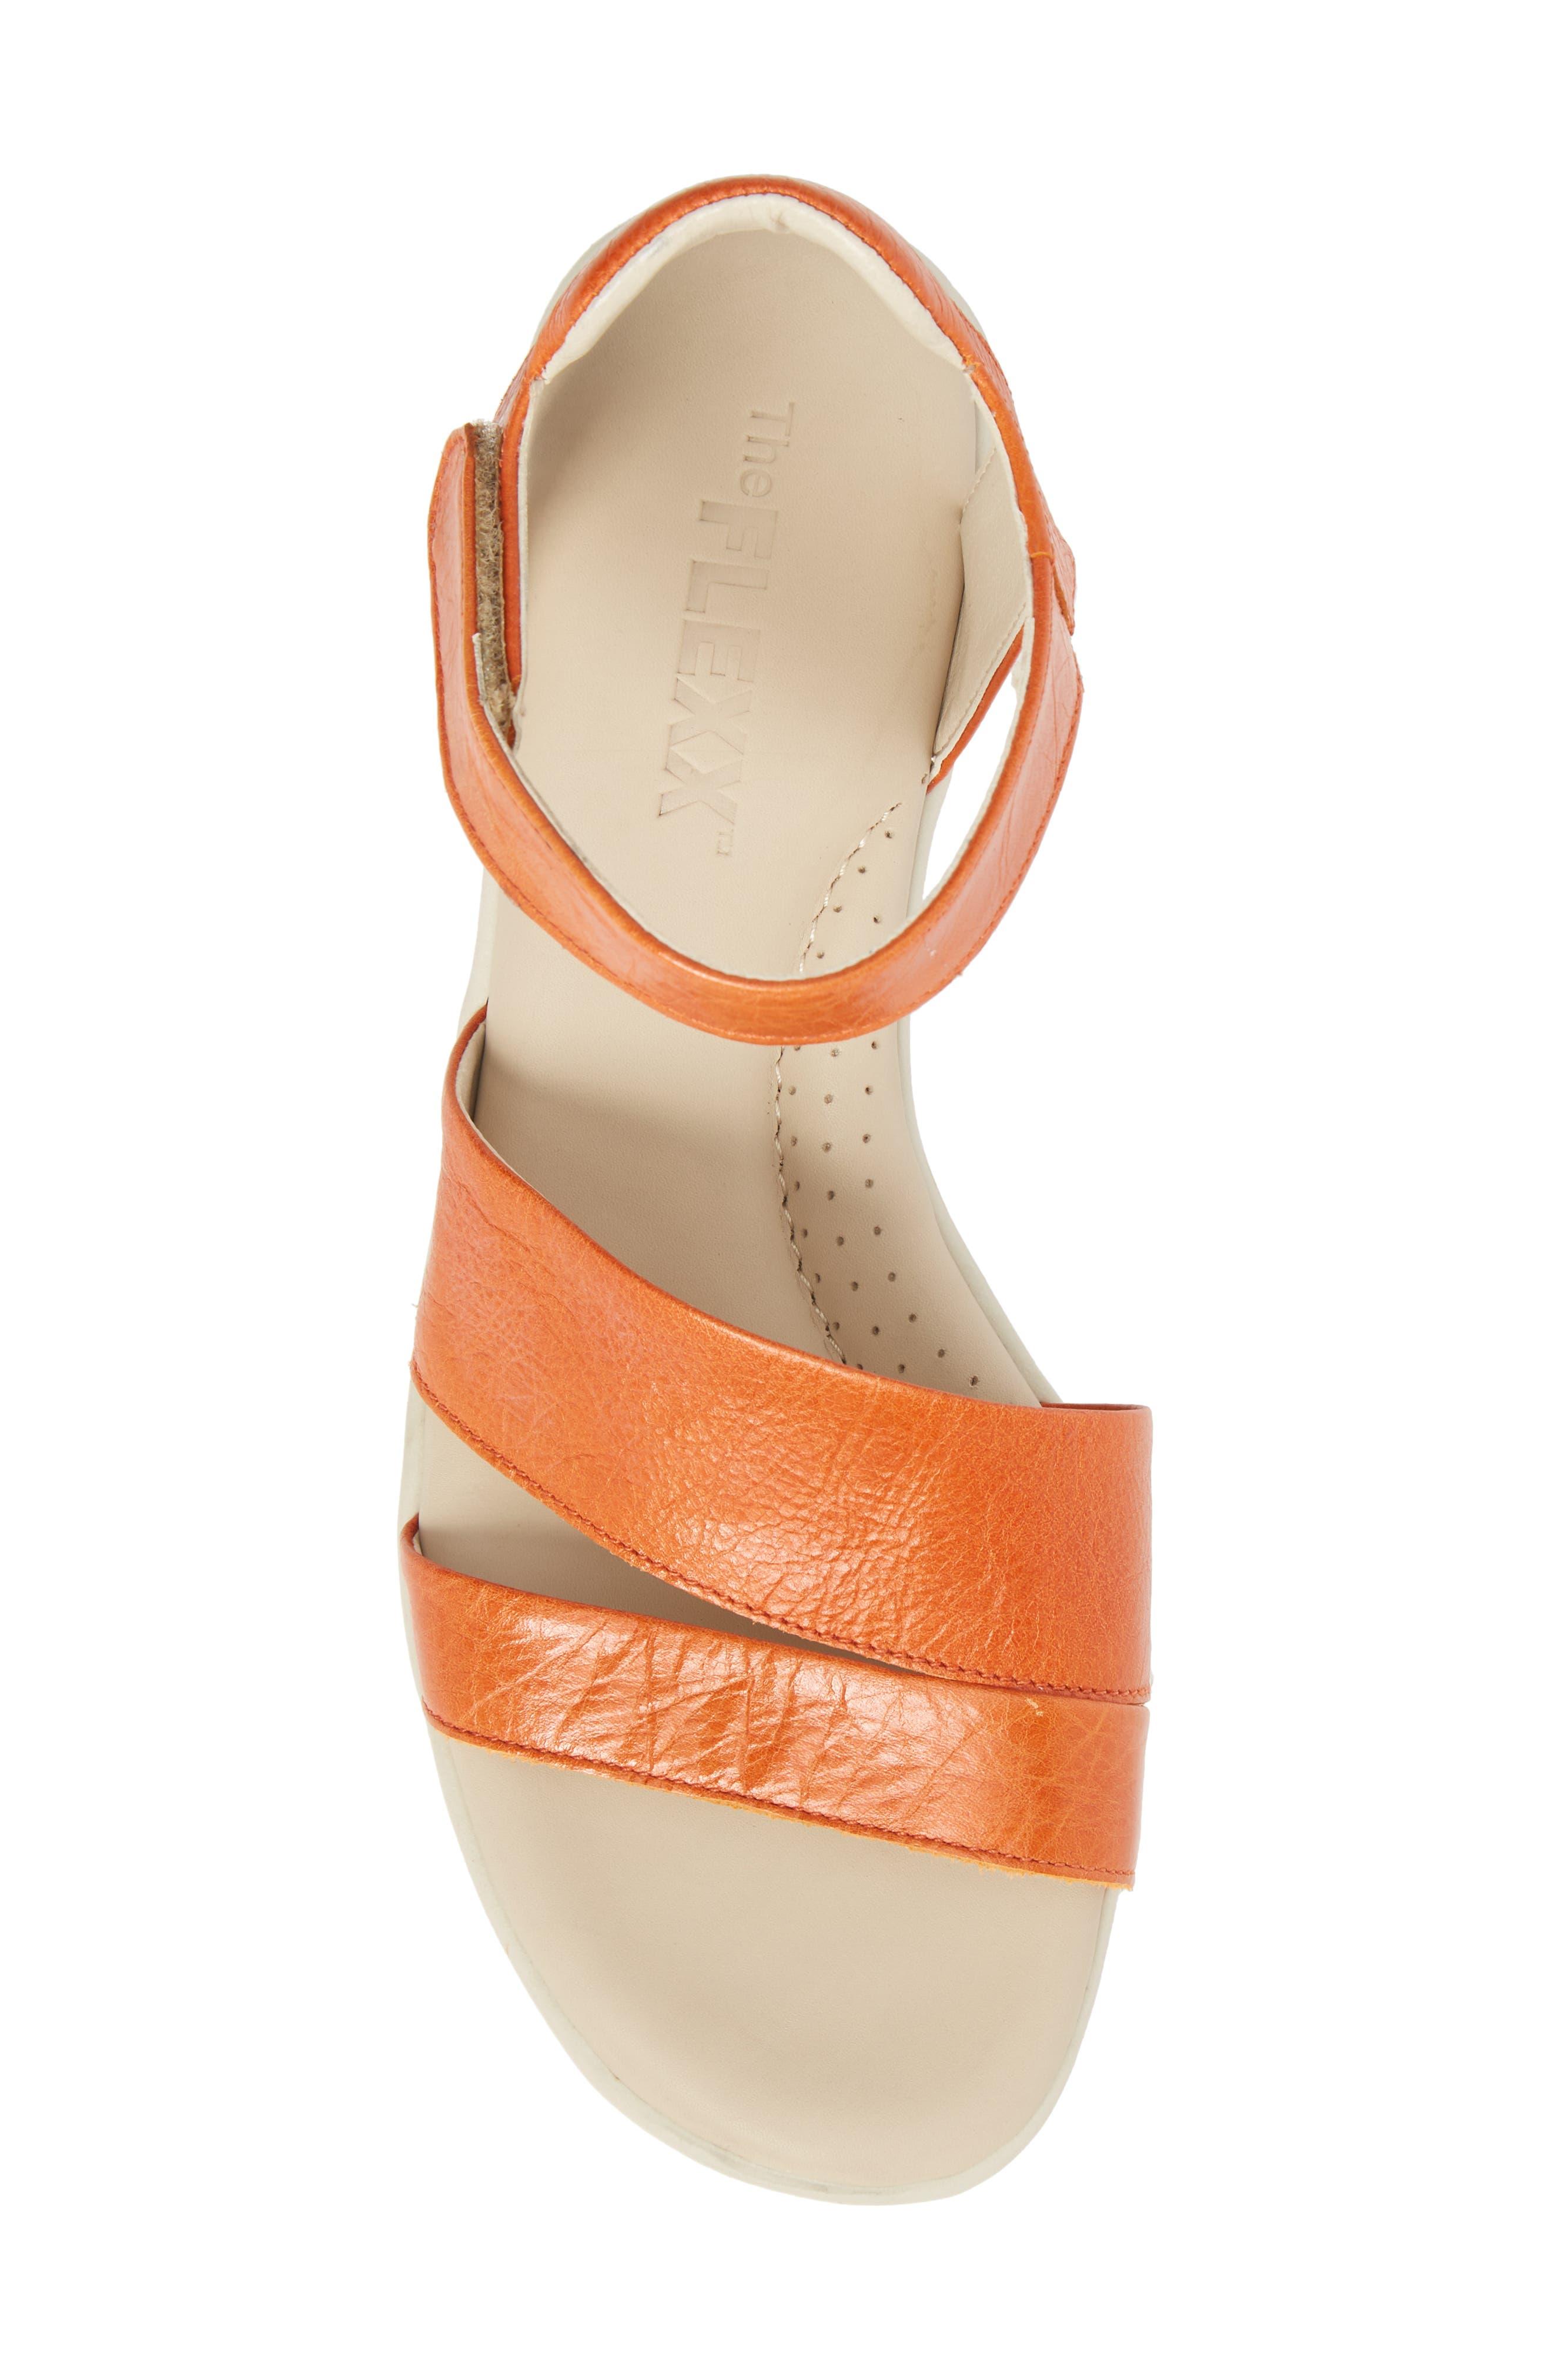 Crossover Ankle Strap Sandal,                             Alternate thumbnail 5, color,                             Mandarin Leather